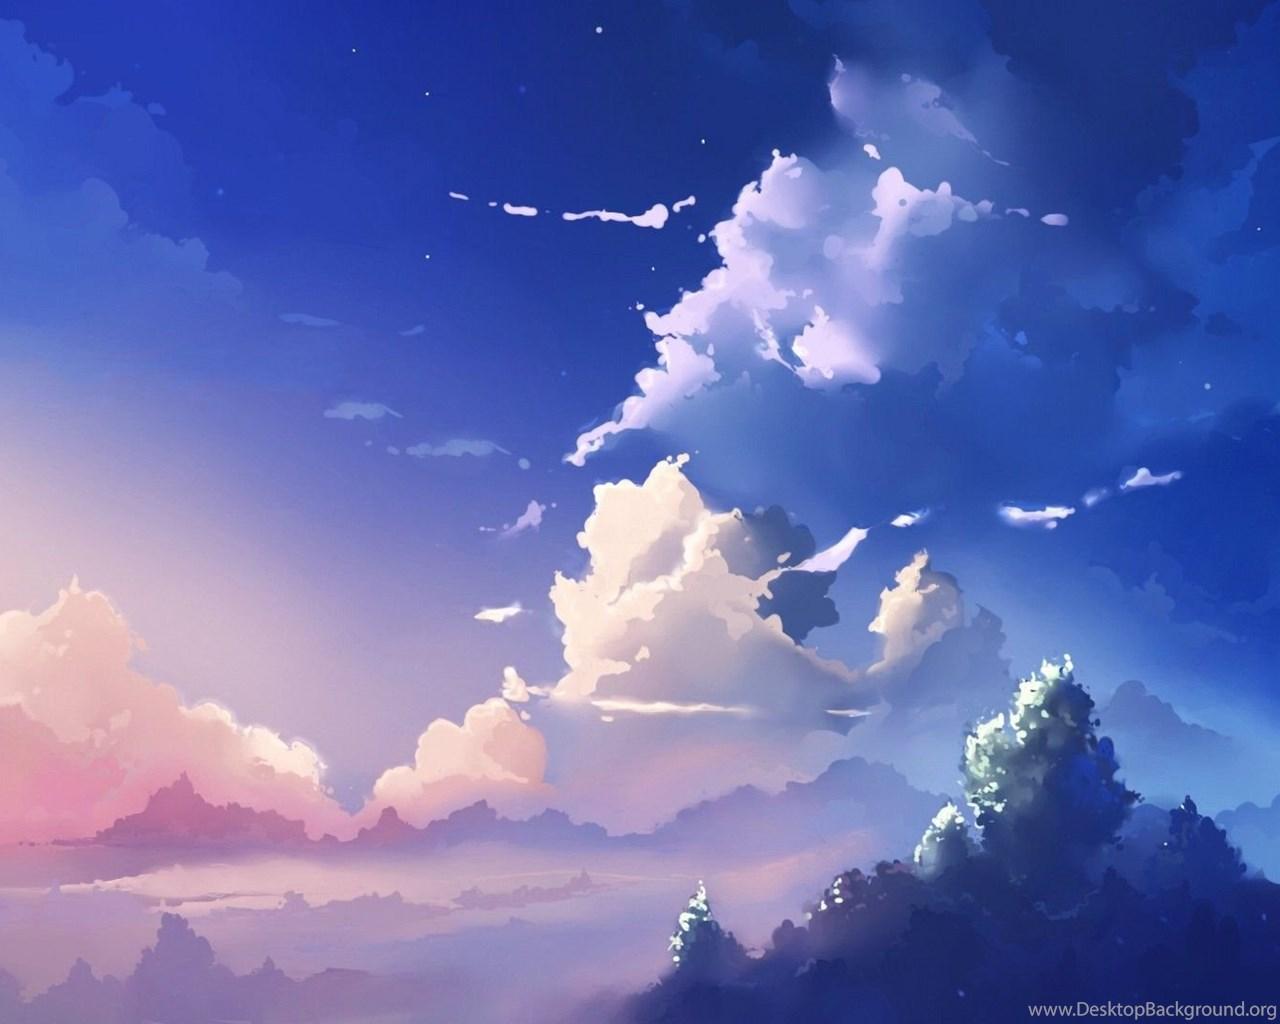 Anime Sky Scenery, Cloud Scenery 05 Desktop Background